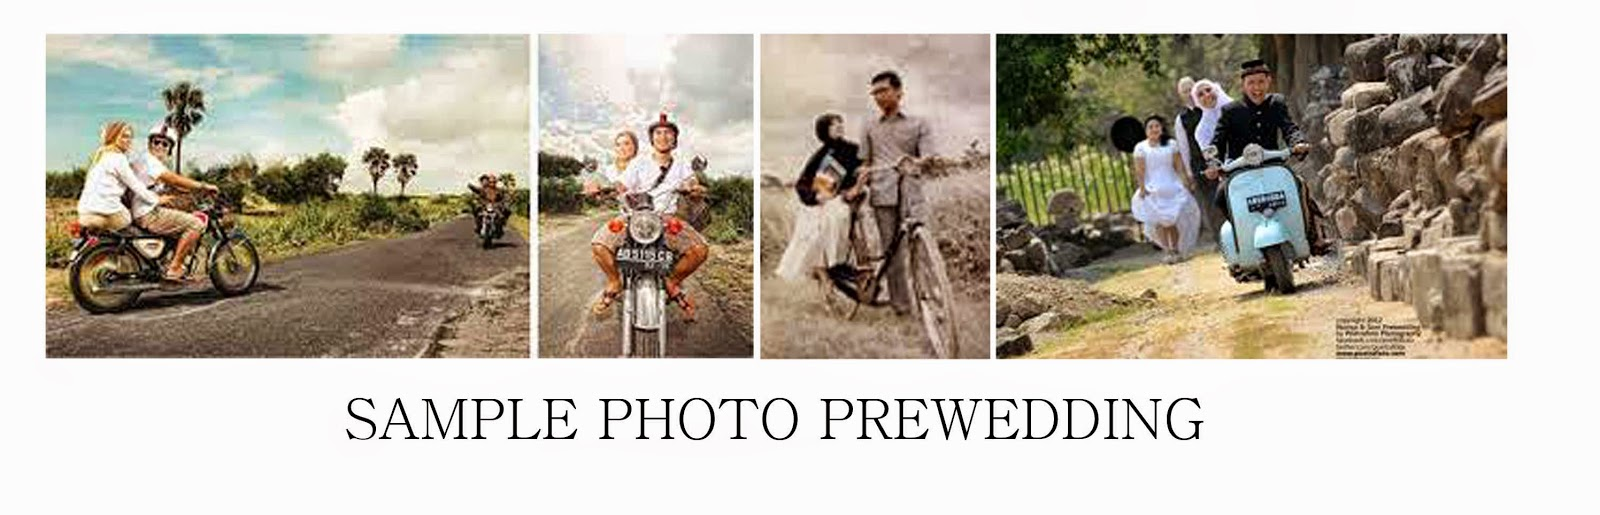 Contoh Gambar Pra Wedding